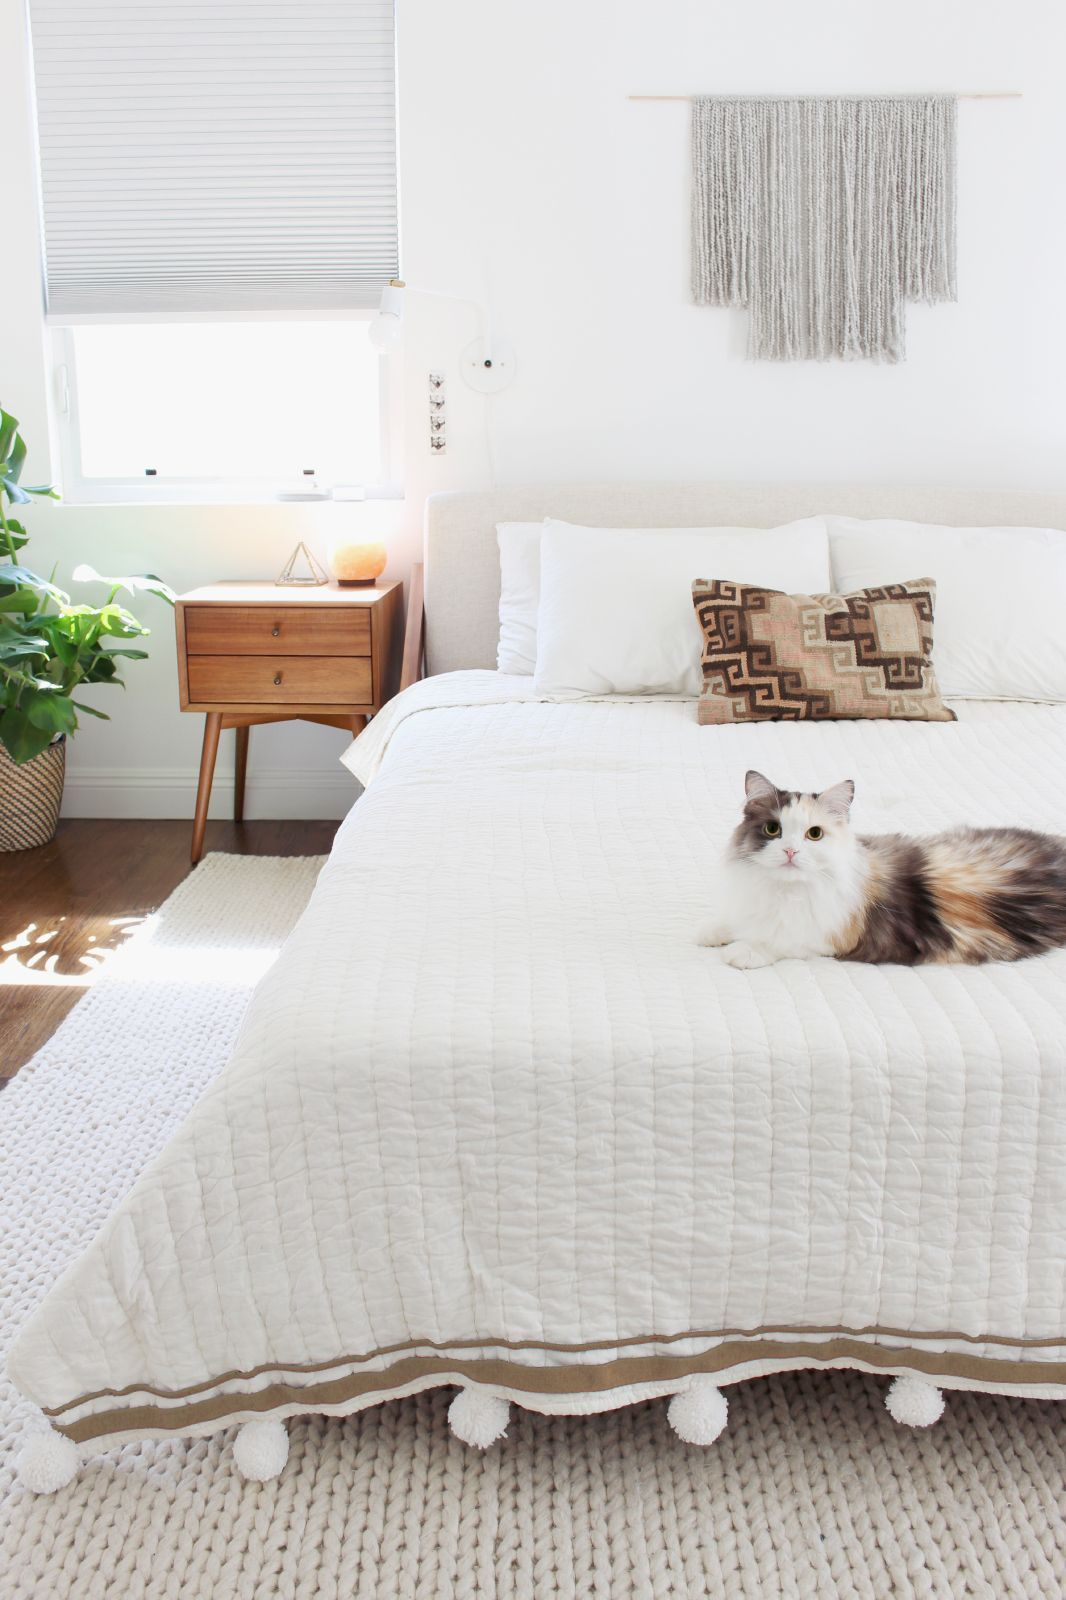 DIY Cozy Apartment Ideas For Fall | Diy home decor bedroom ...